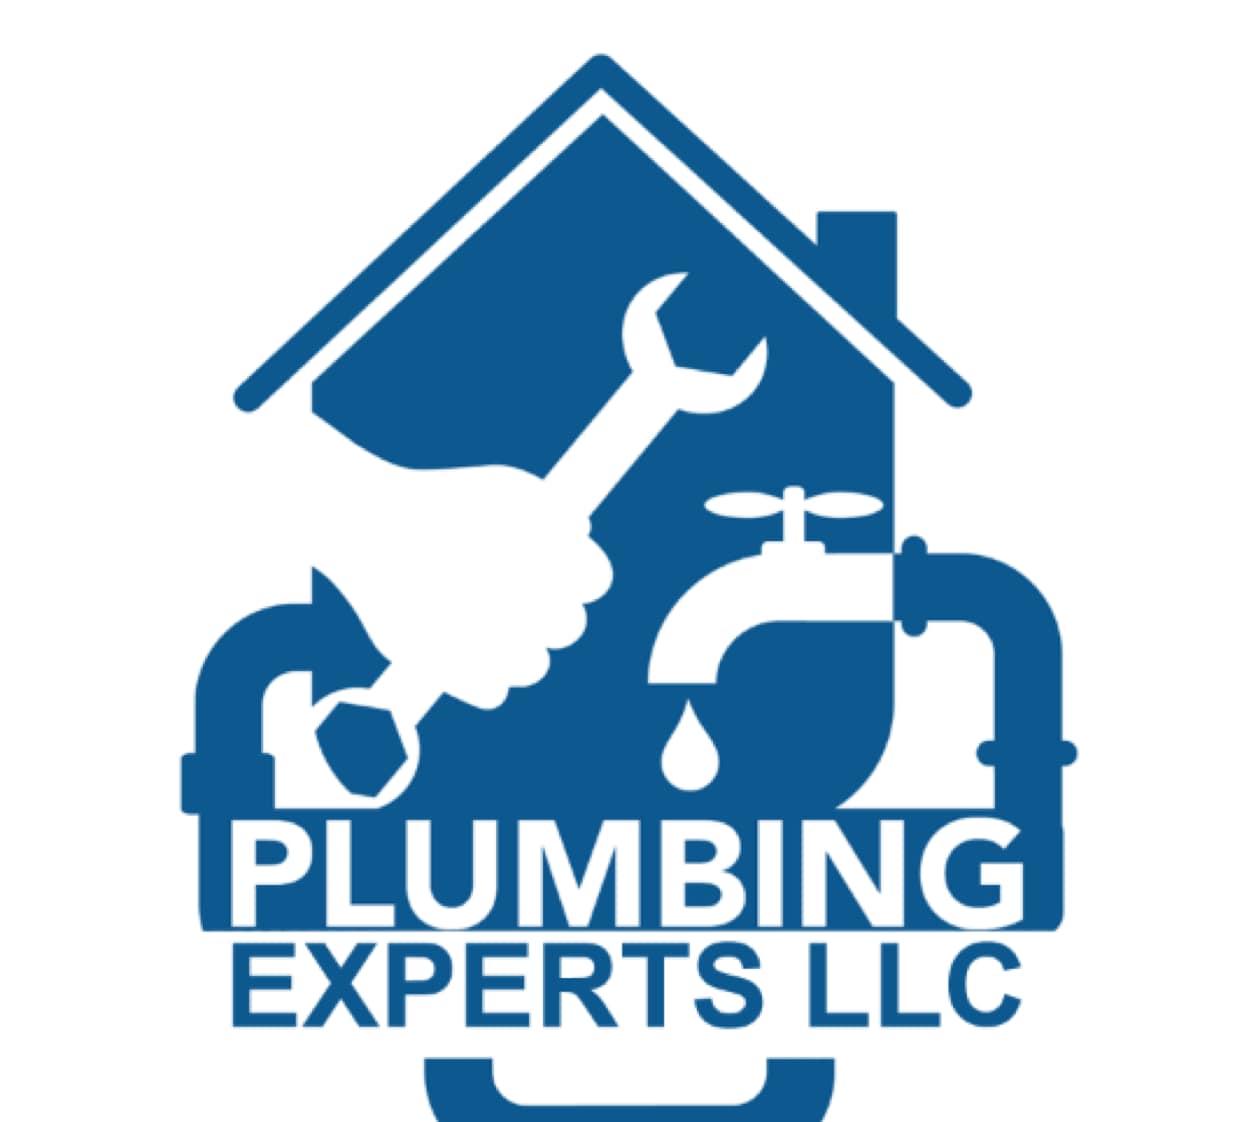 Plumbing Experts, LLC